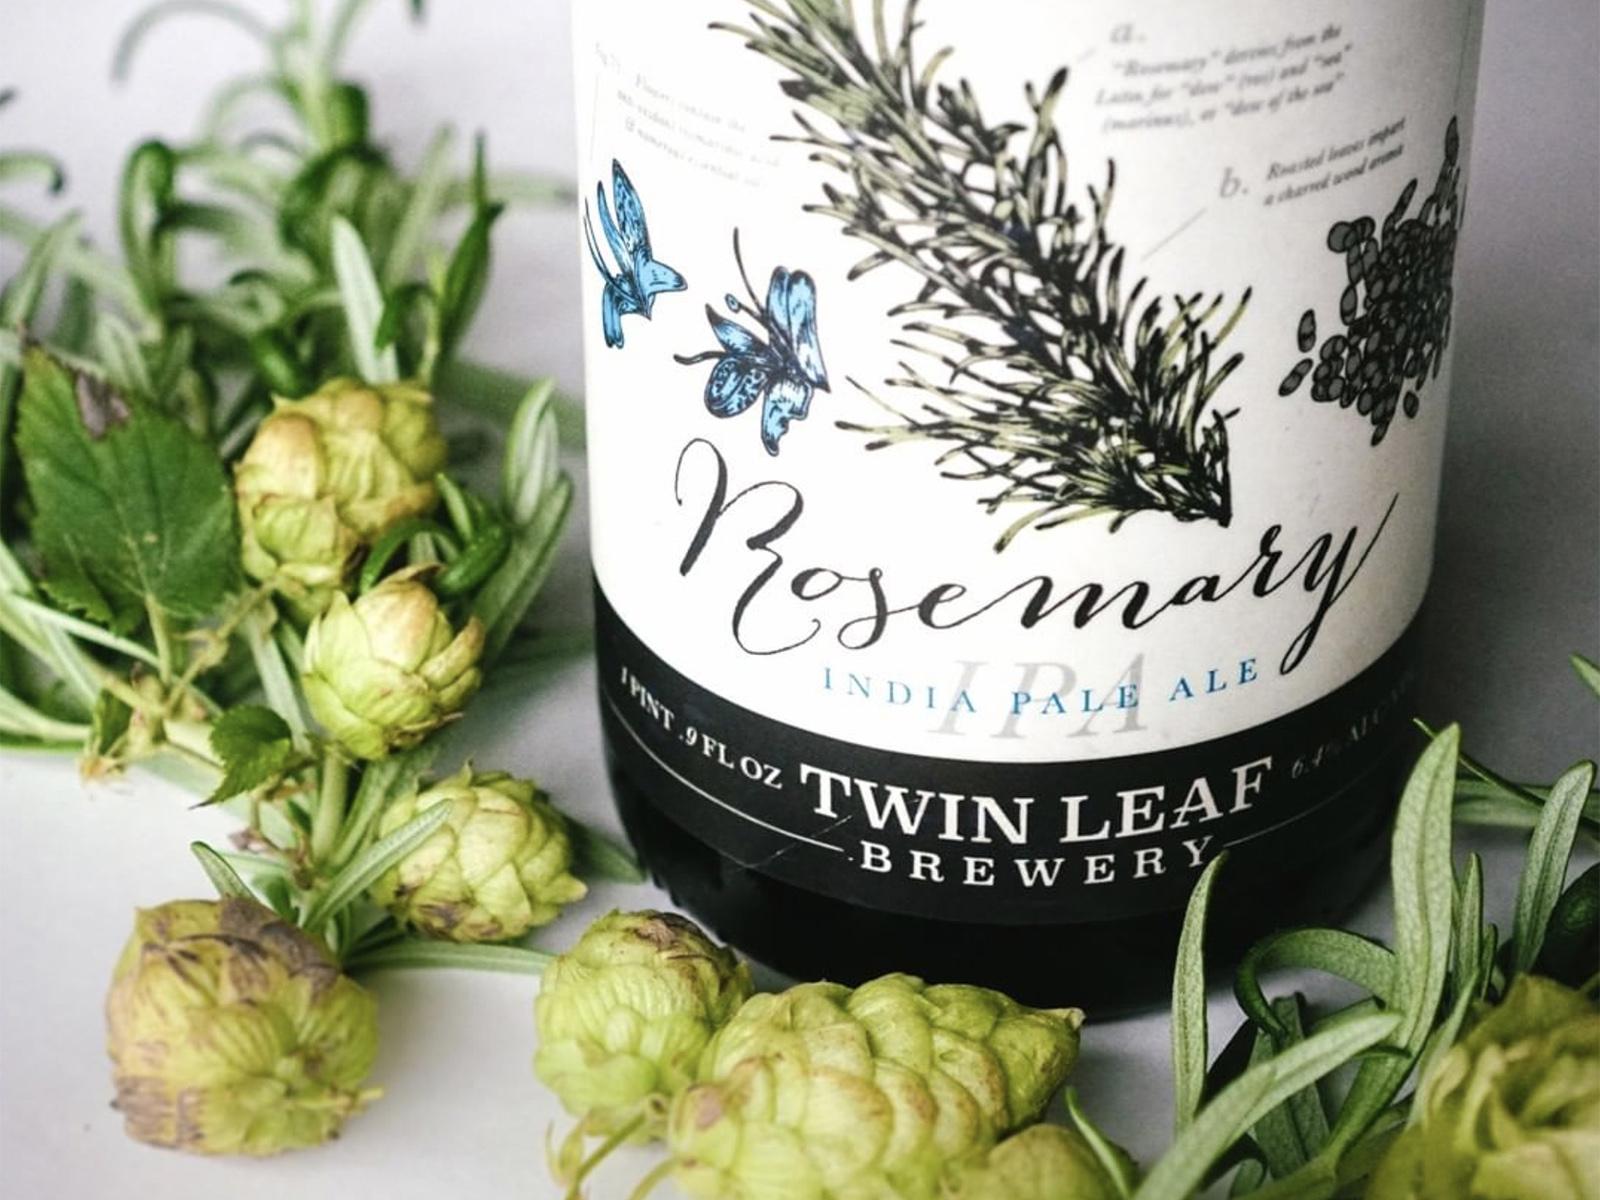 Twin leaf rosemary ipa label design copy